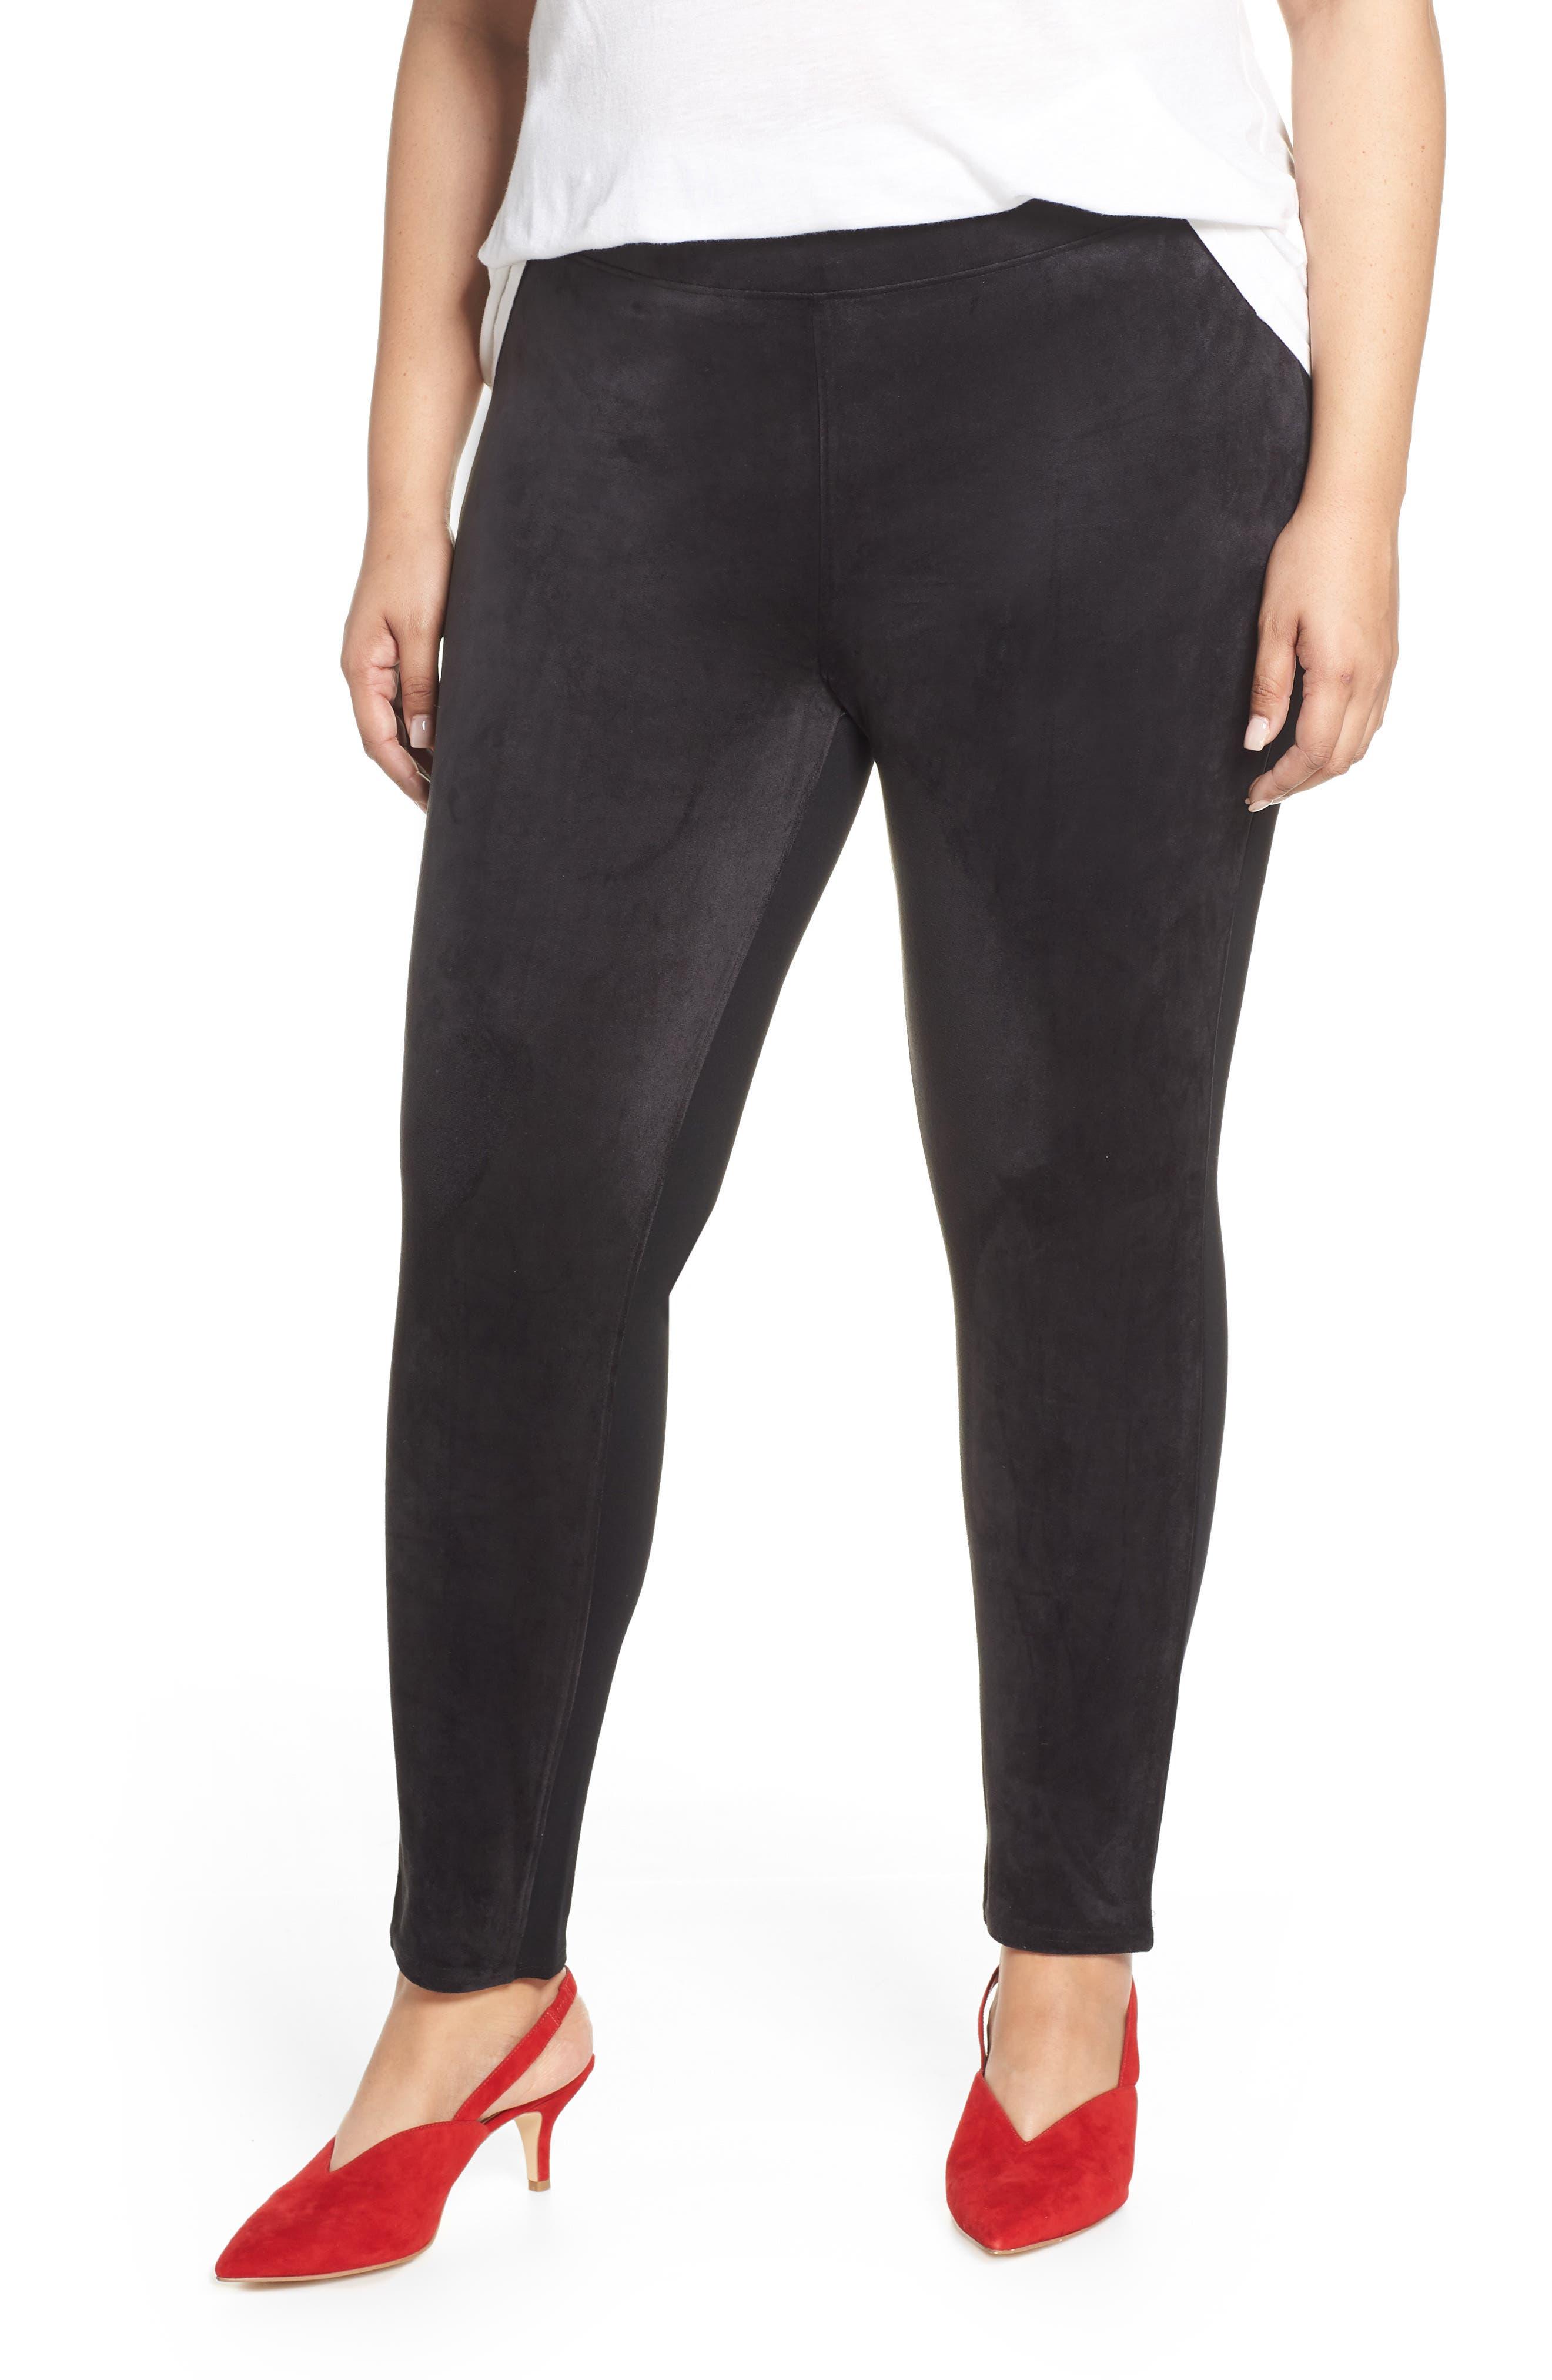 SEVEN7,                             High Rise Pull-On Vegan Leather Pants,                             Main thumbnail 1, color,                             CAVIAR